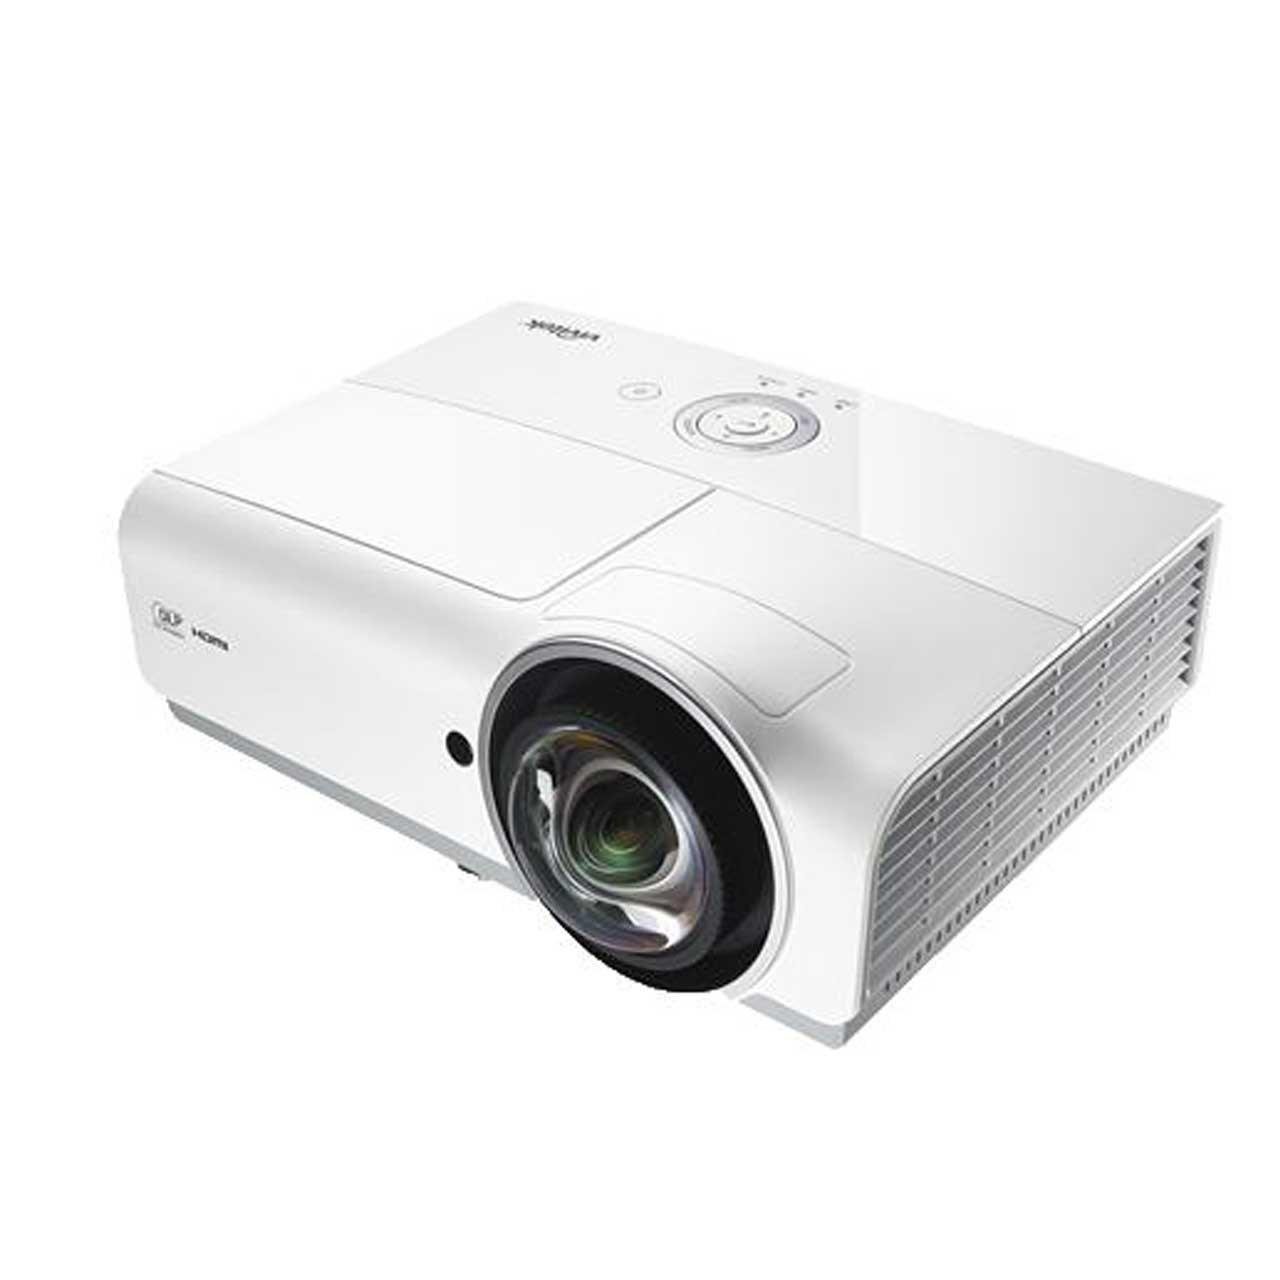 قیمت                      ویدئو پروژکتور ویویتک مدل ES2808F